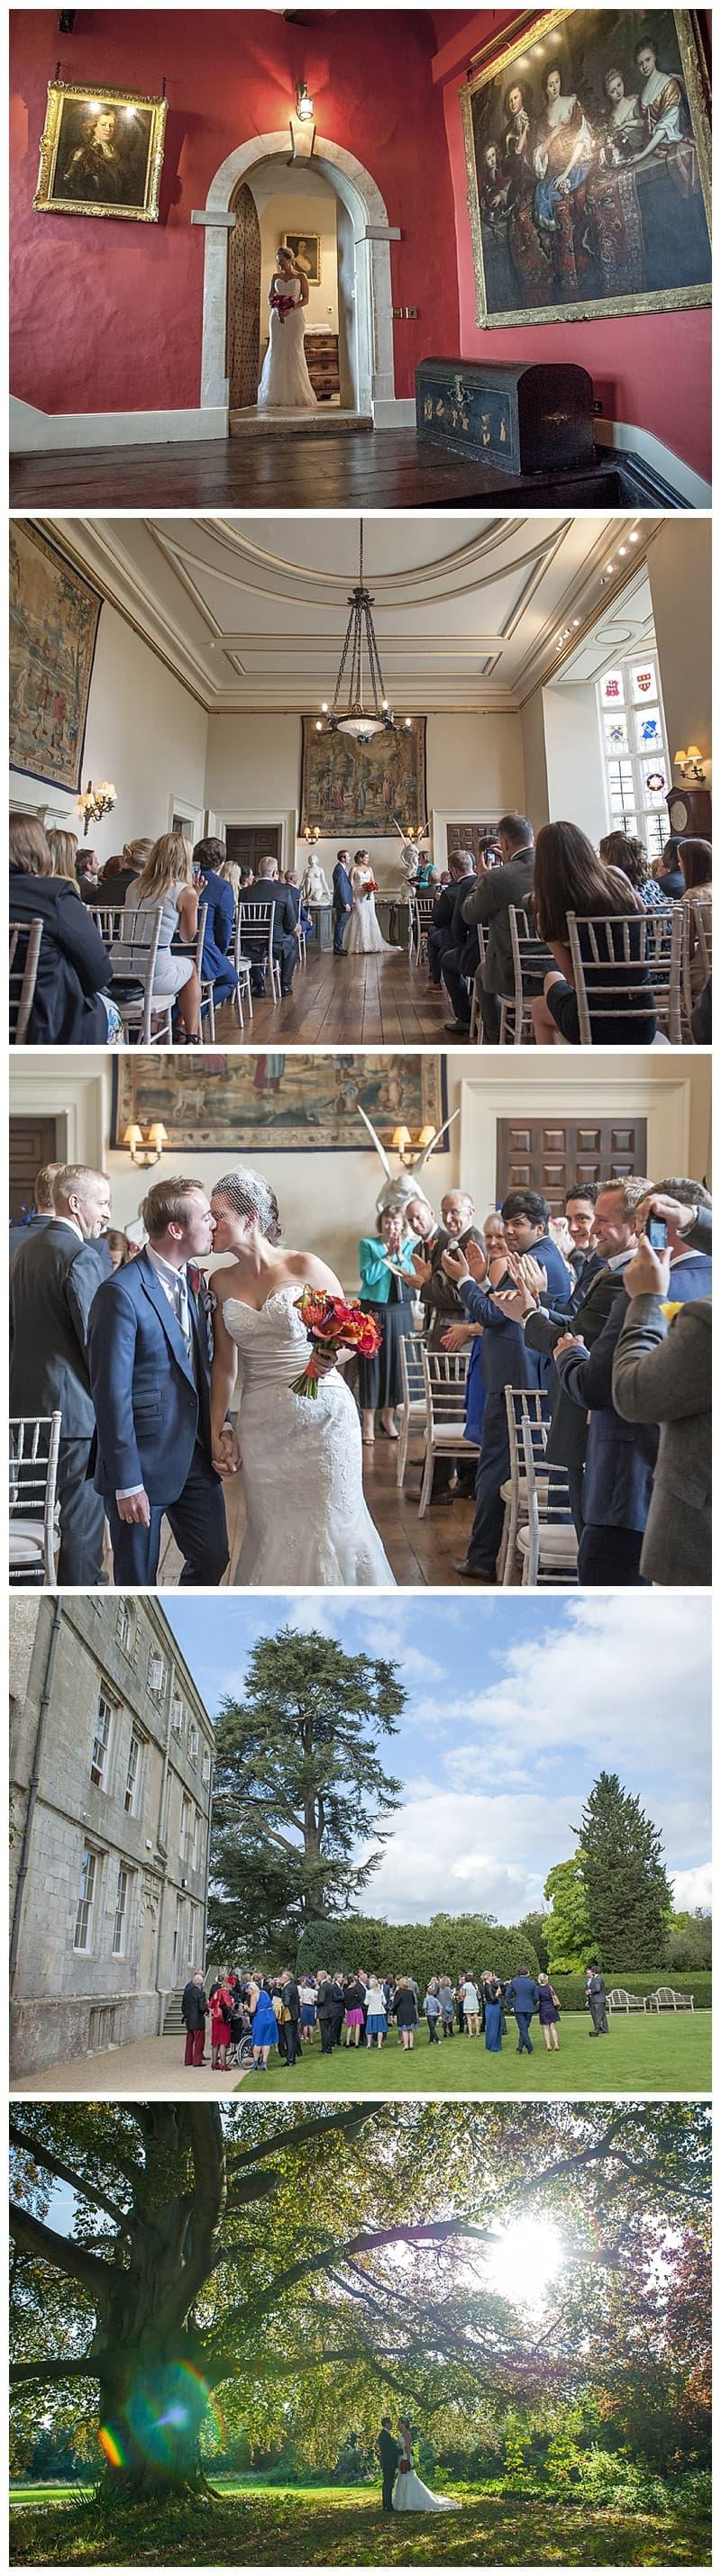 Dan & Frida's Elmore Court Wedding, Gloucestershire. Benjamin Wetherall Photography, London0005